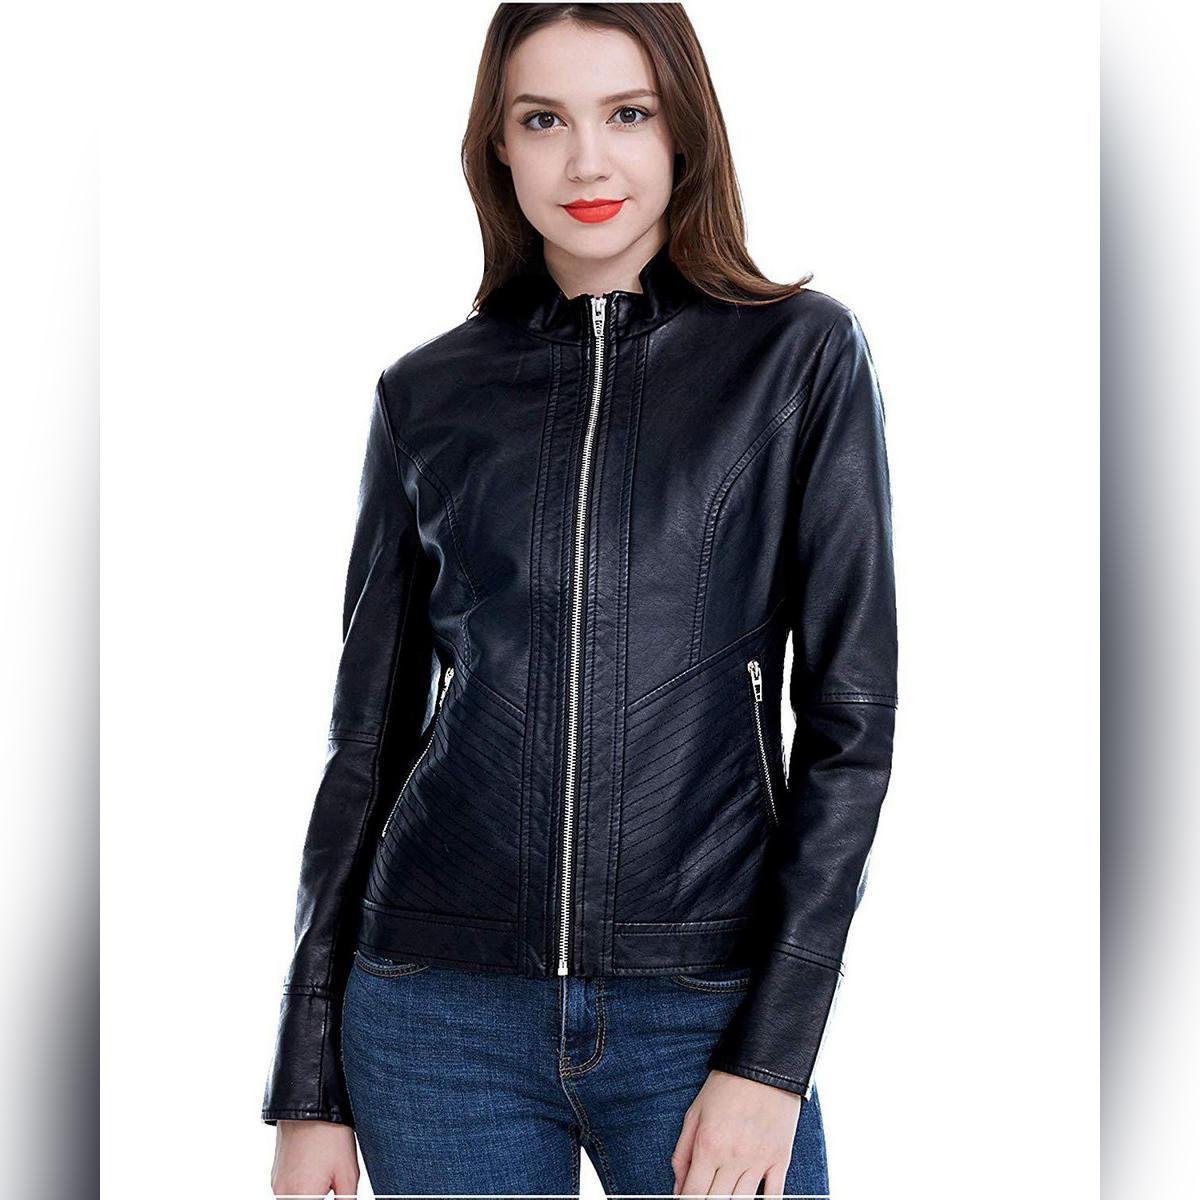 Ladies Pu Leather Jacket Women Pu Leather Jacket LL-01